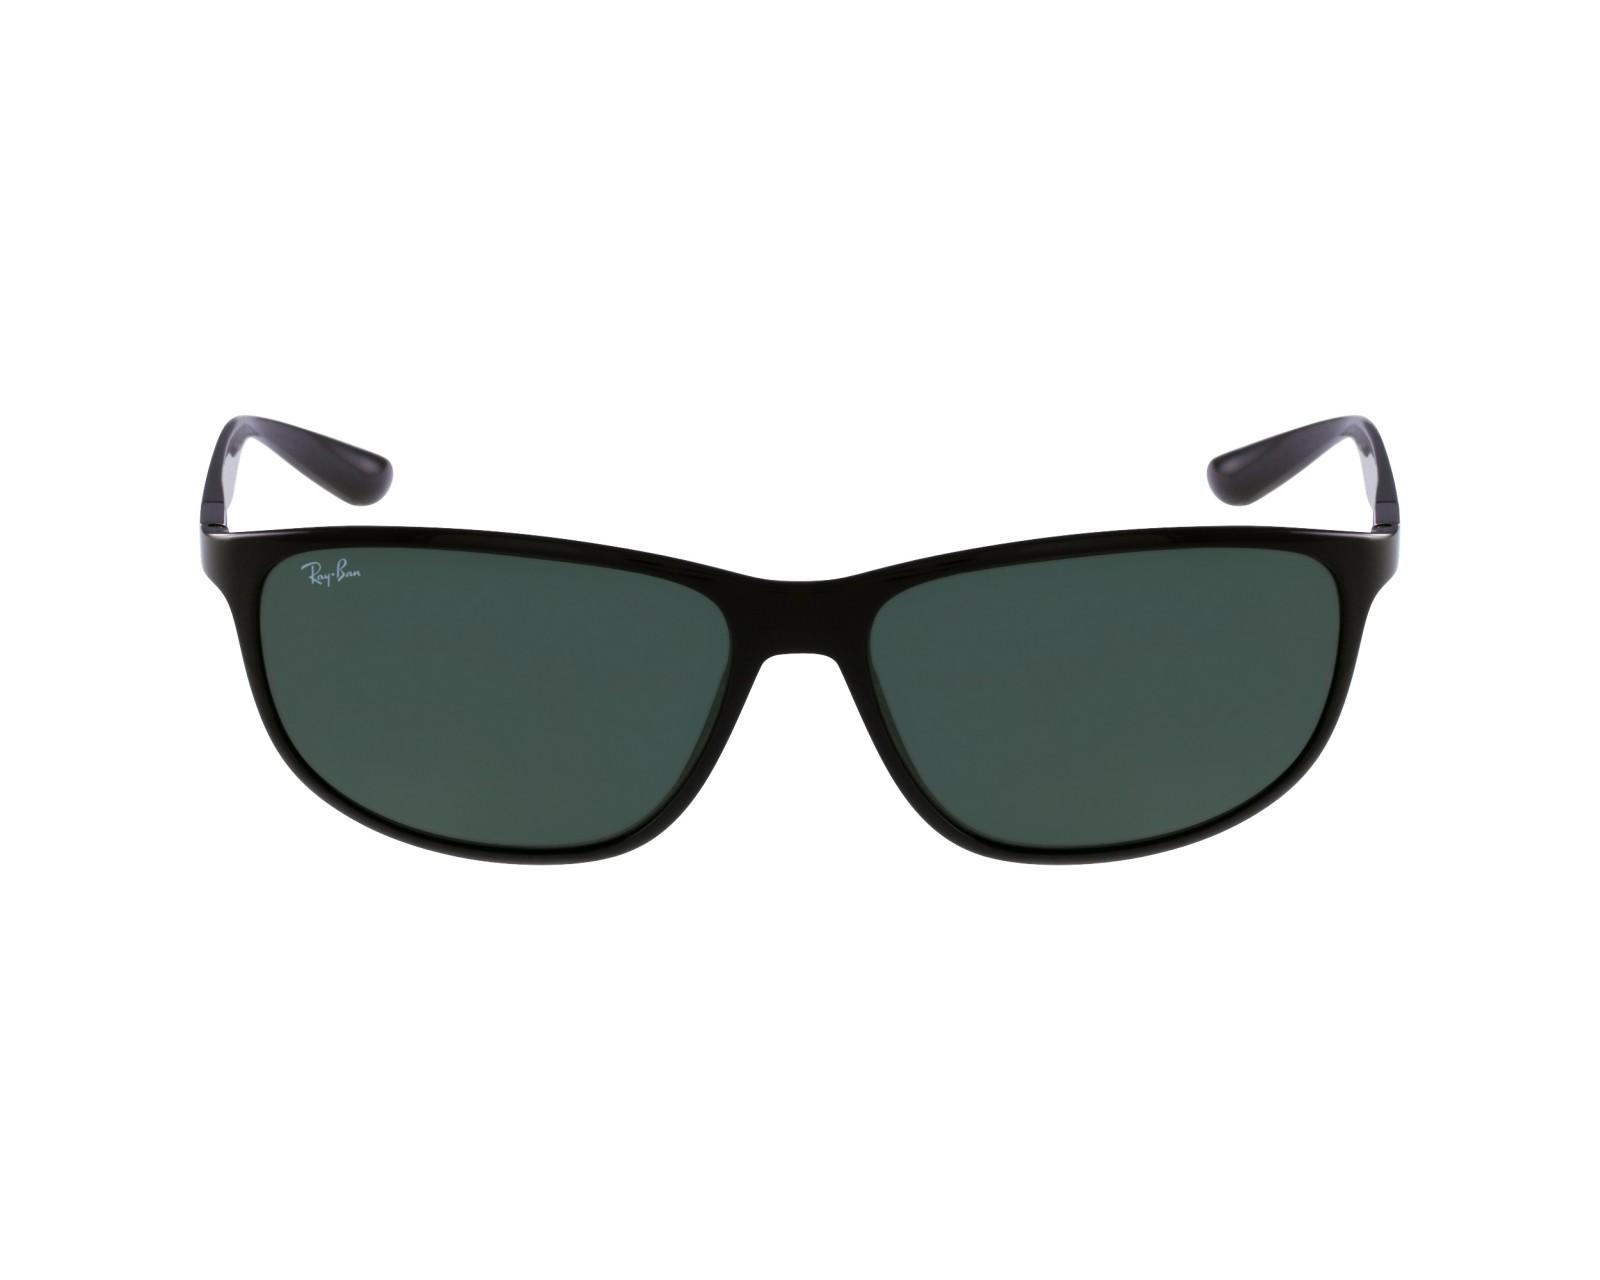 771b9227c03 thumbnail Sunglasses Ray-Ban RB-4213 601 71 - Black profile view